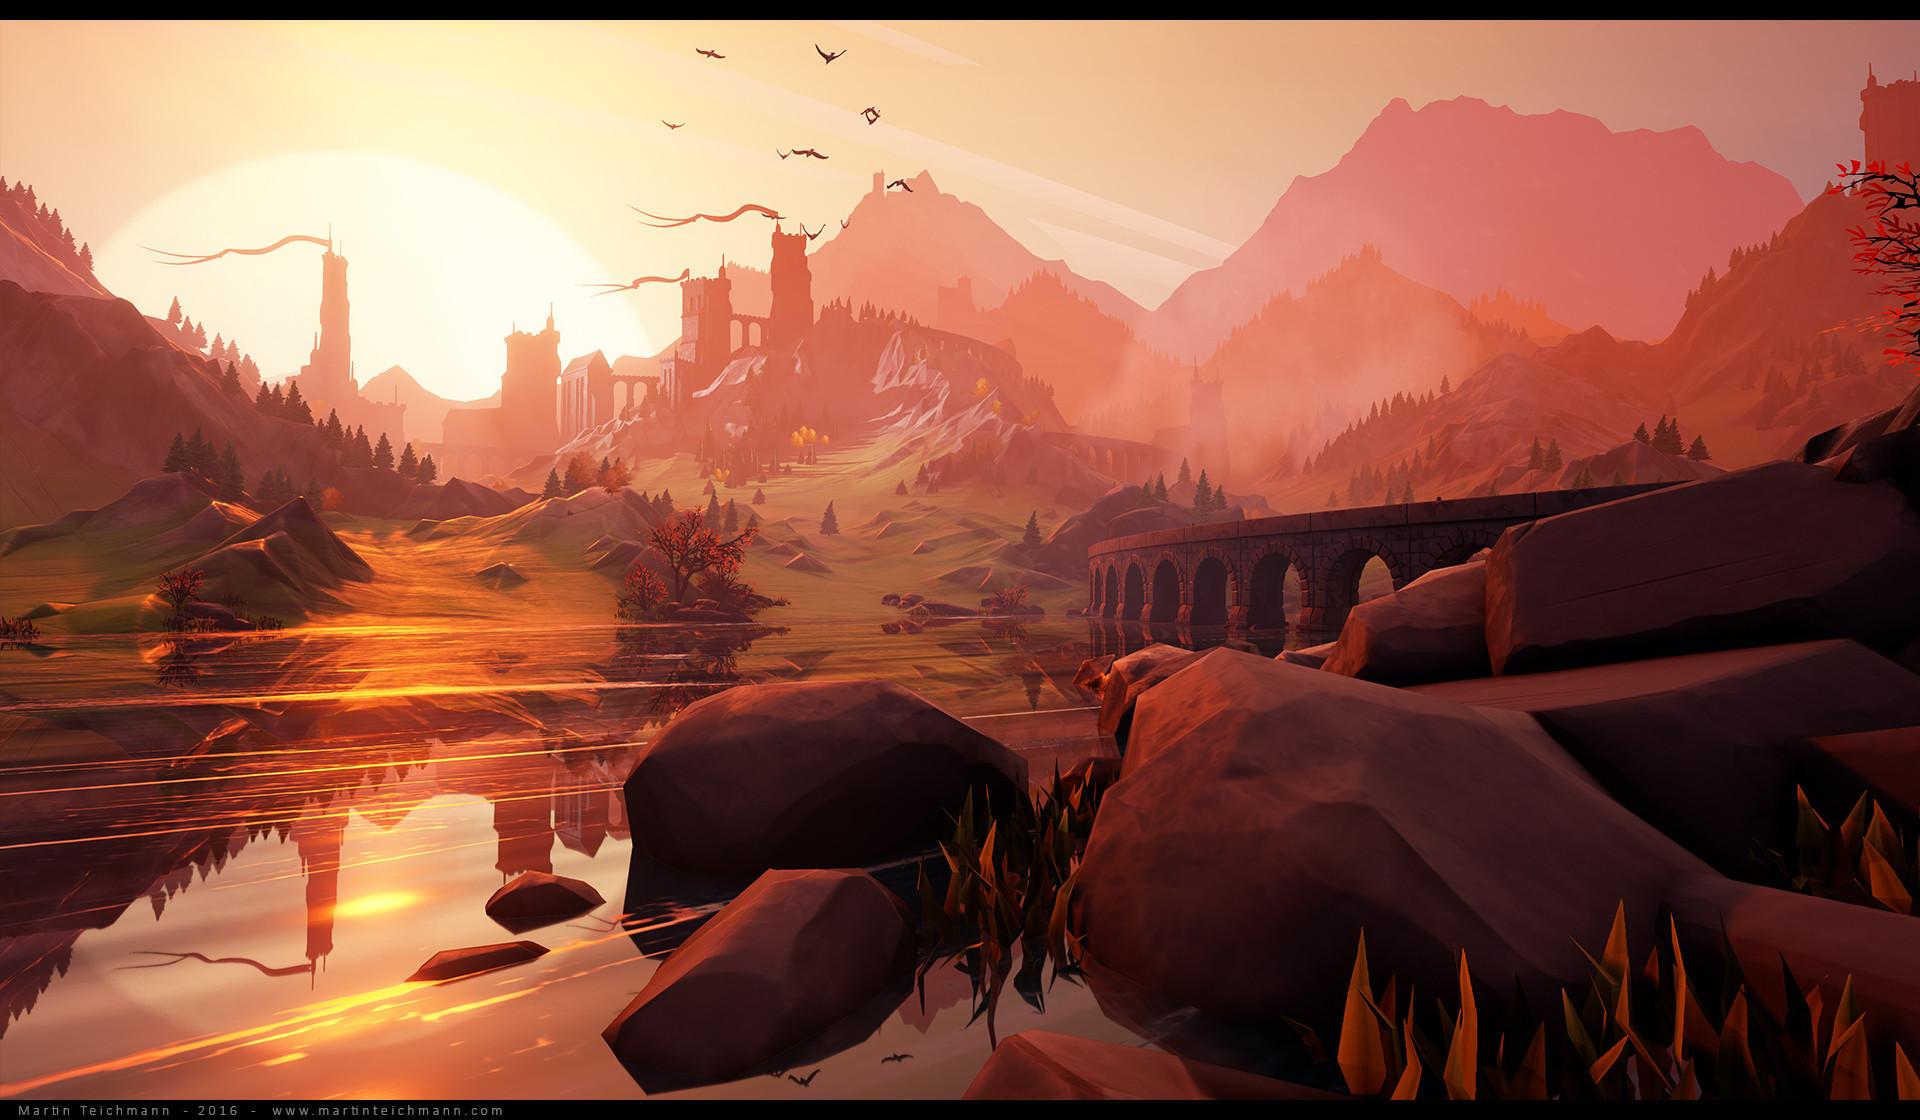 Martin teichmann sunrise landscape 02